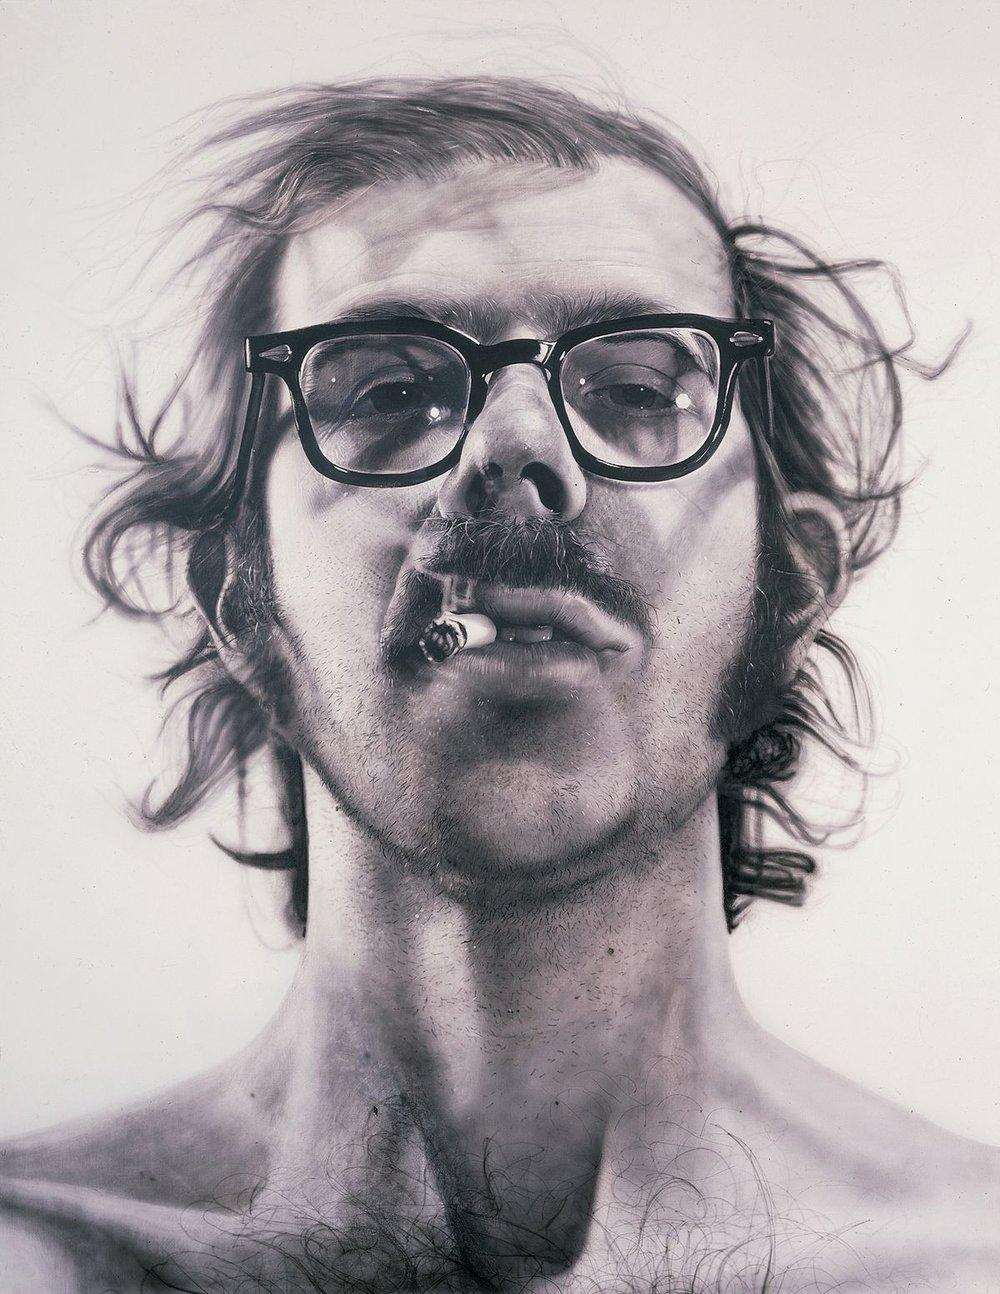 big-self-portrait-1967-1968-chuck-close.jpg